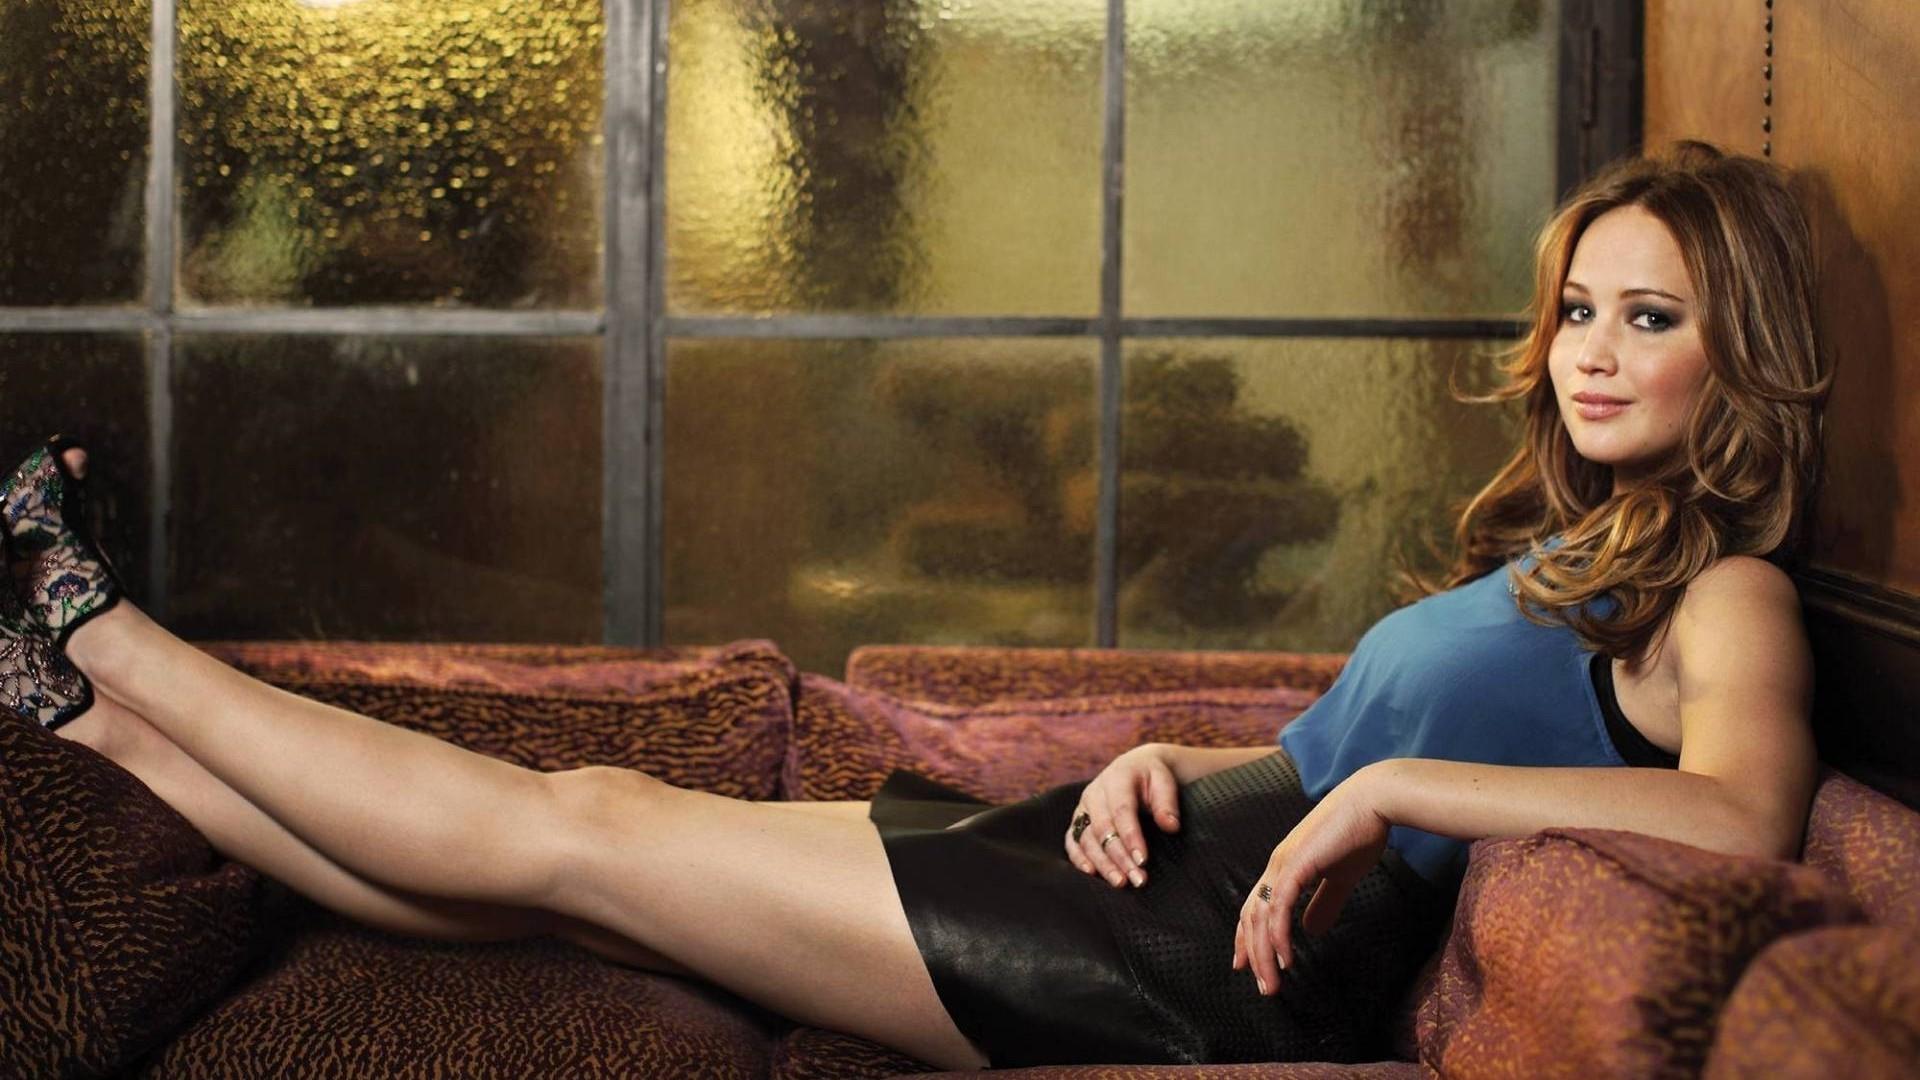 … Jennifer Lawrence nude photos …